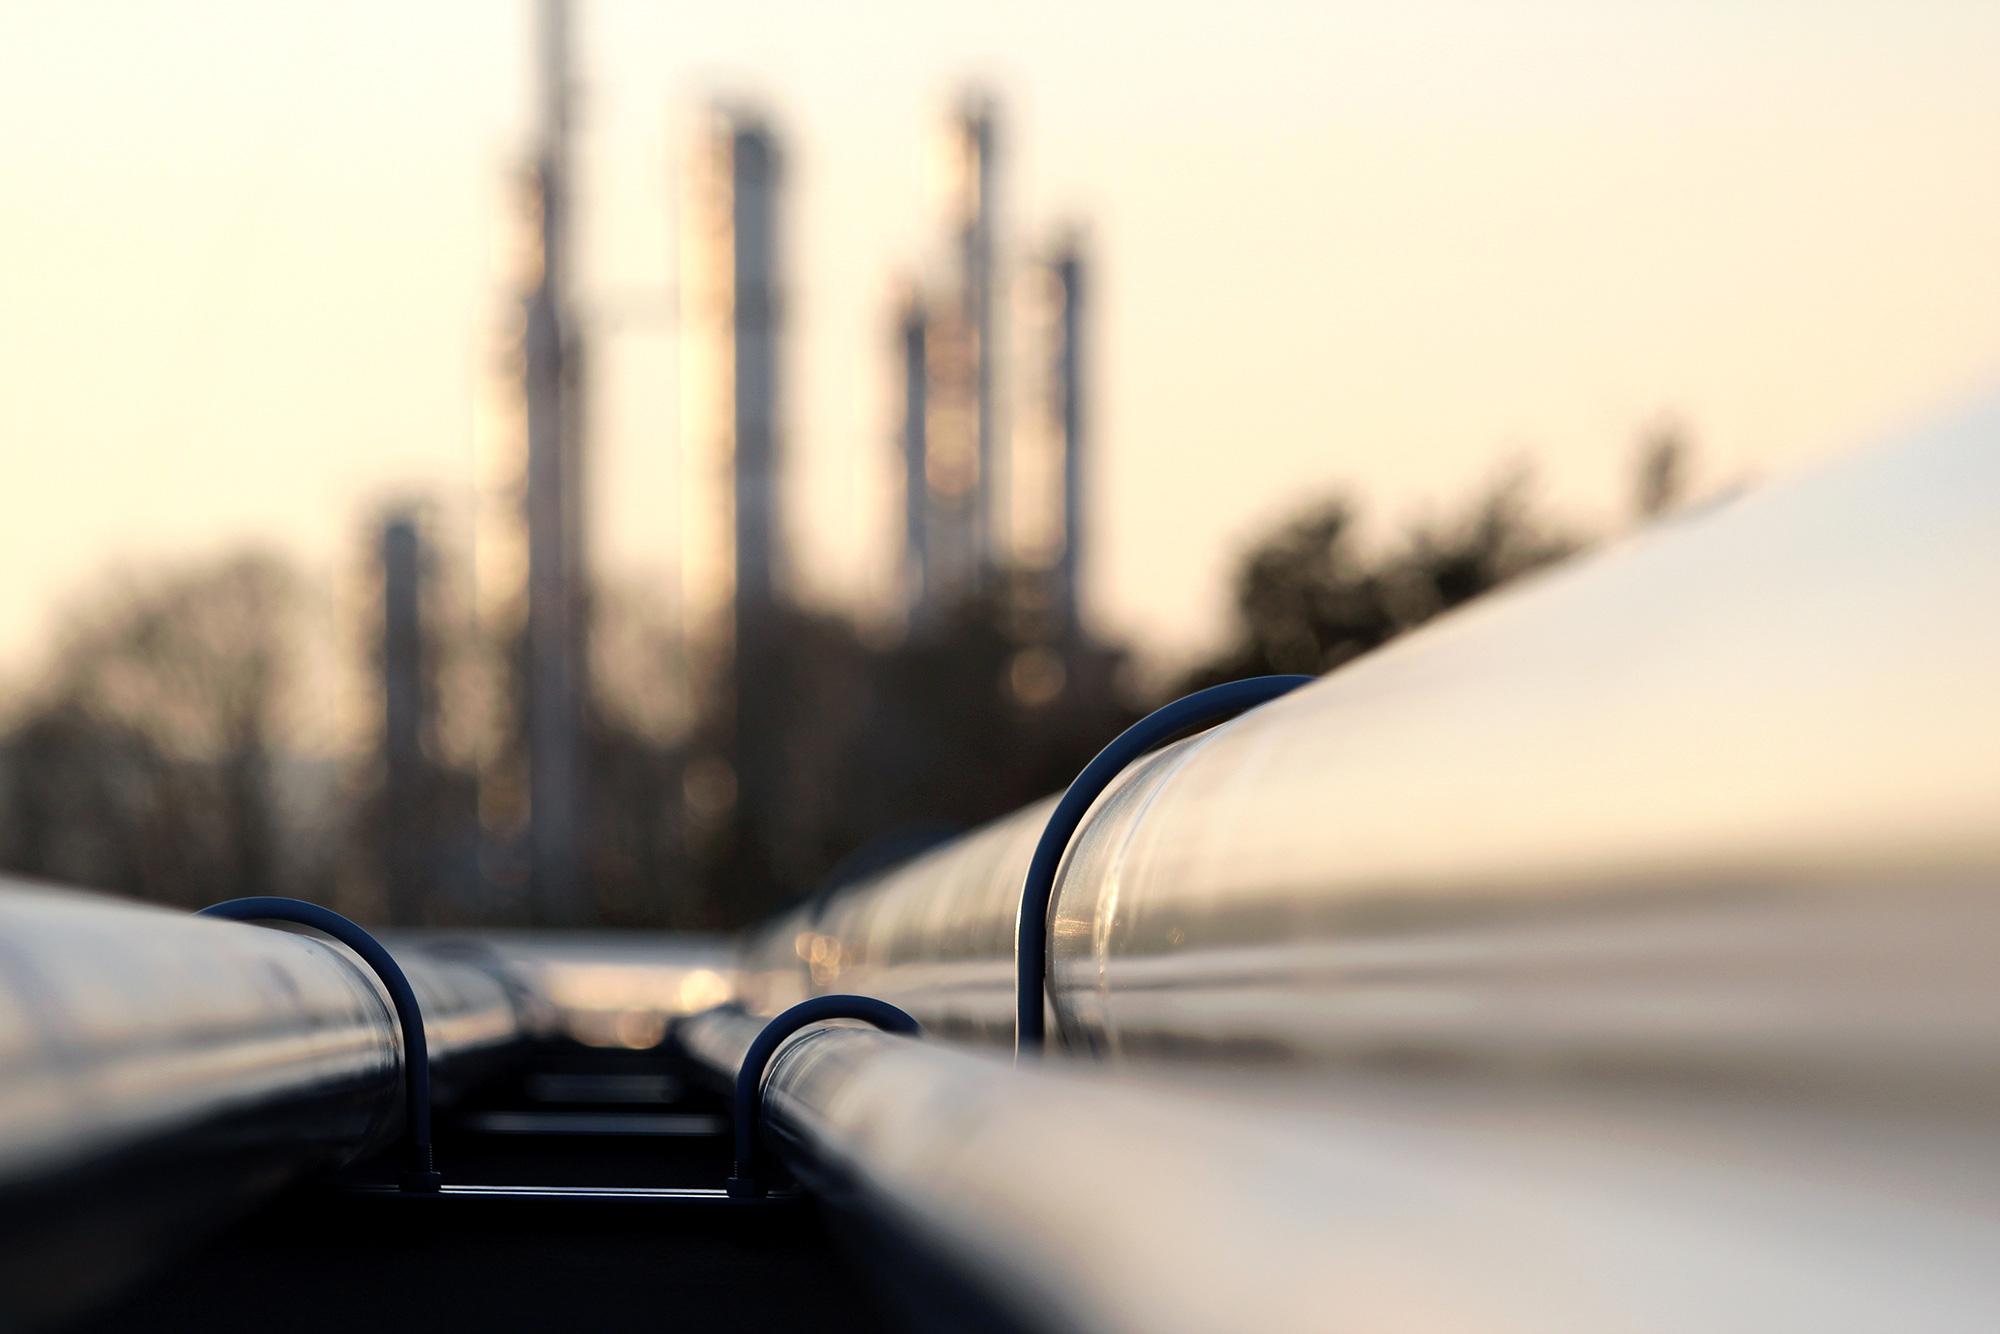 intrepid financial partners interpidfp pipeline jpg